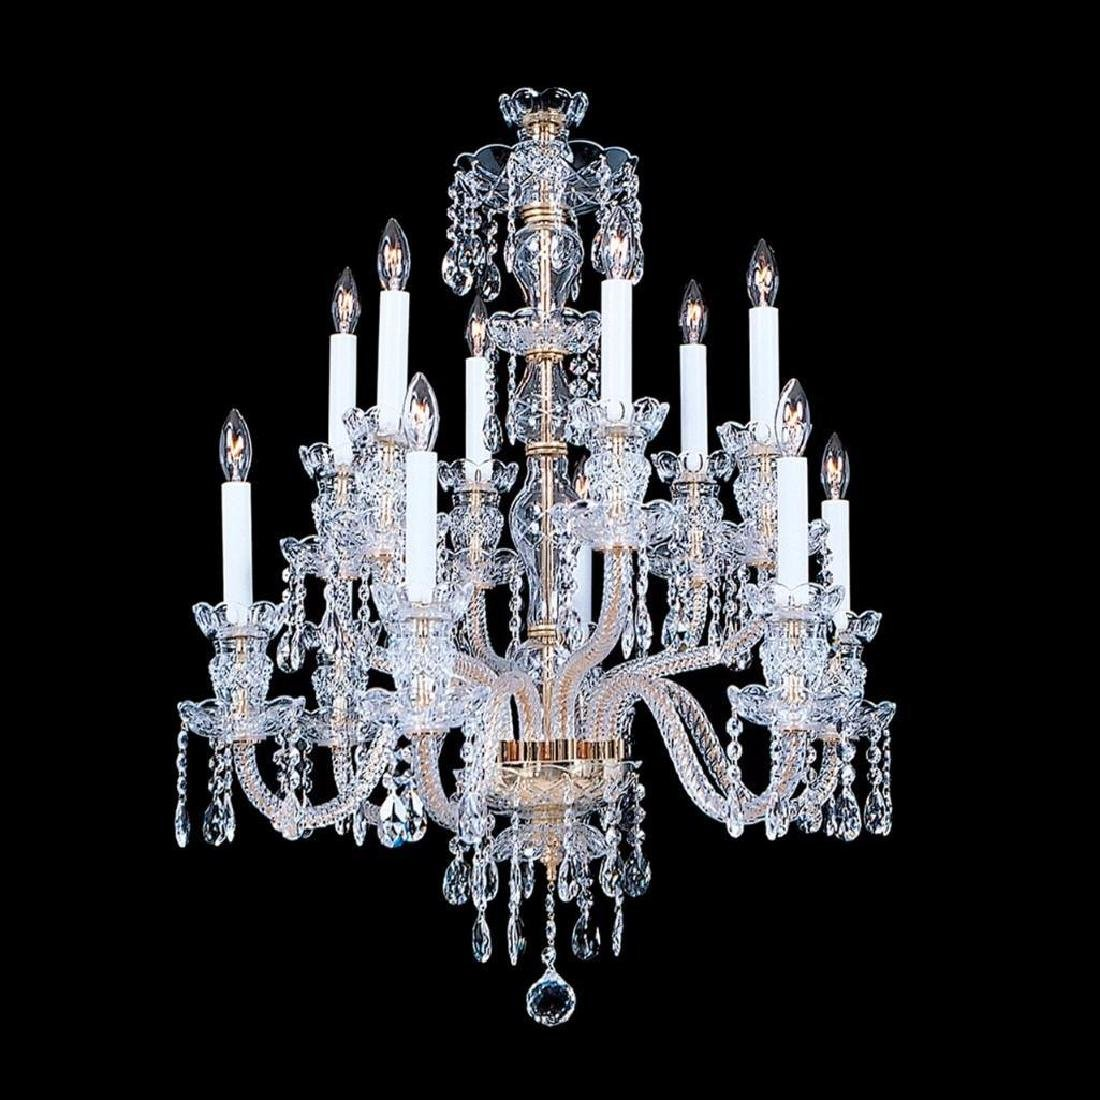 Durham - 12 Light Crystal Chandelier with Swarovski -